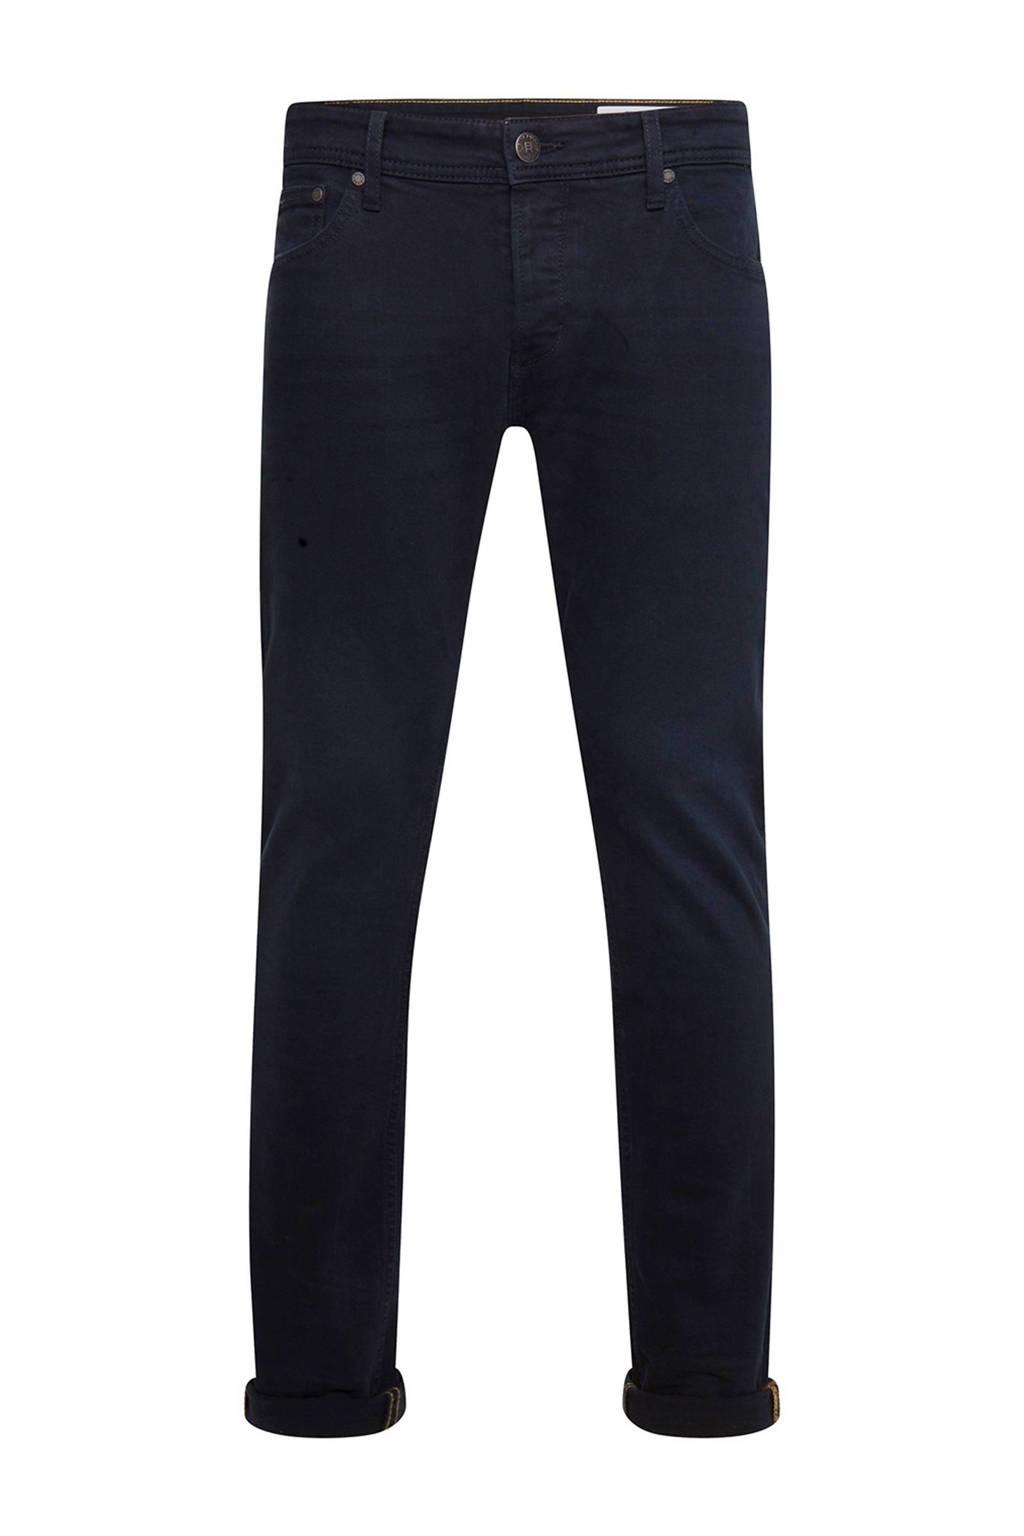 WE Fashion Blue Ridge slim fit broek, Donkerblauw